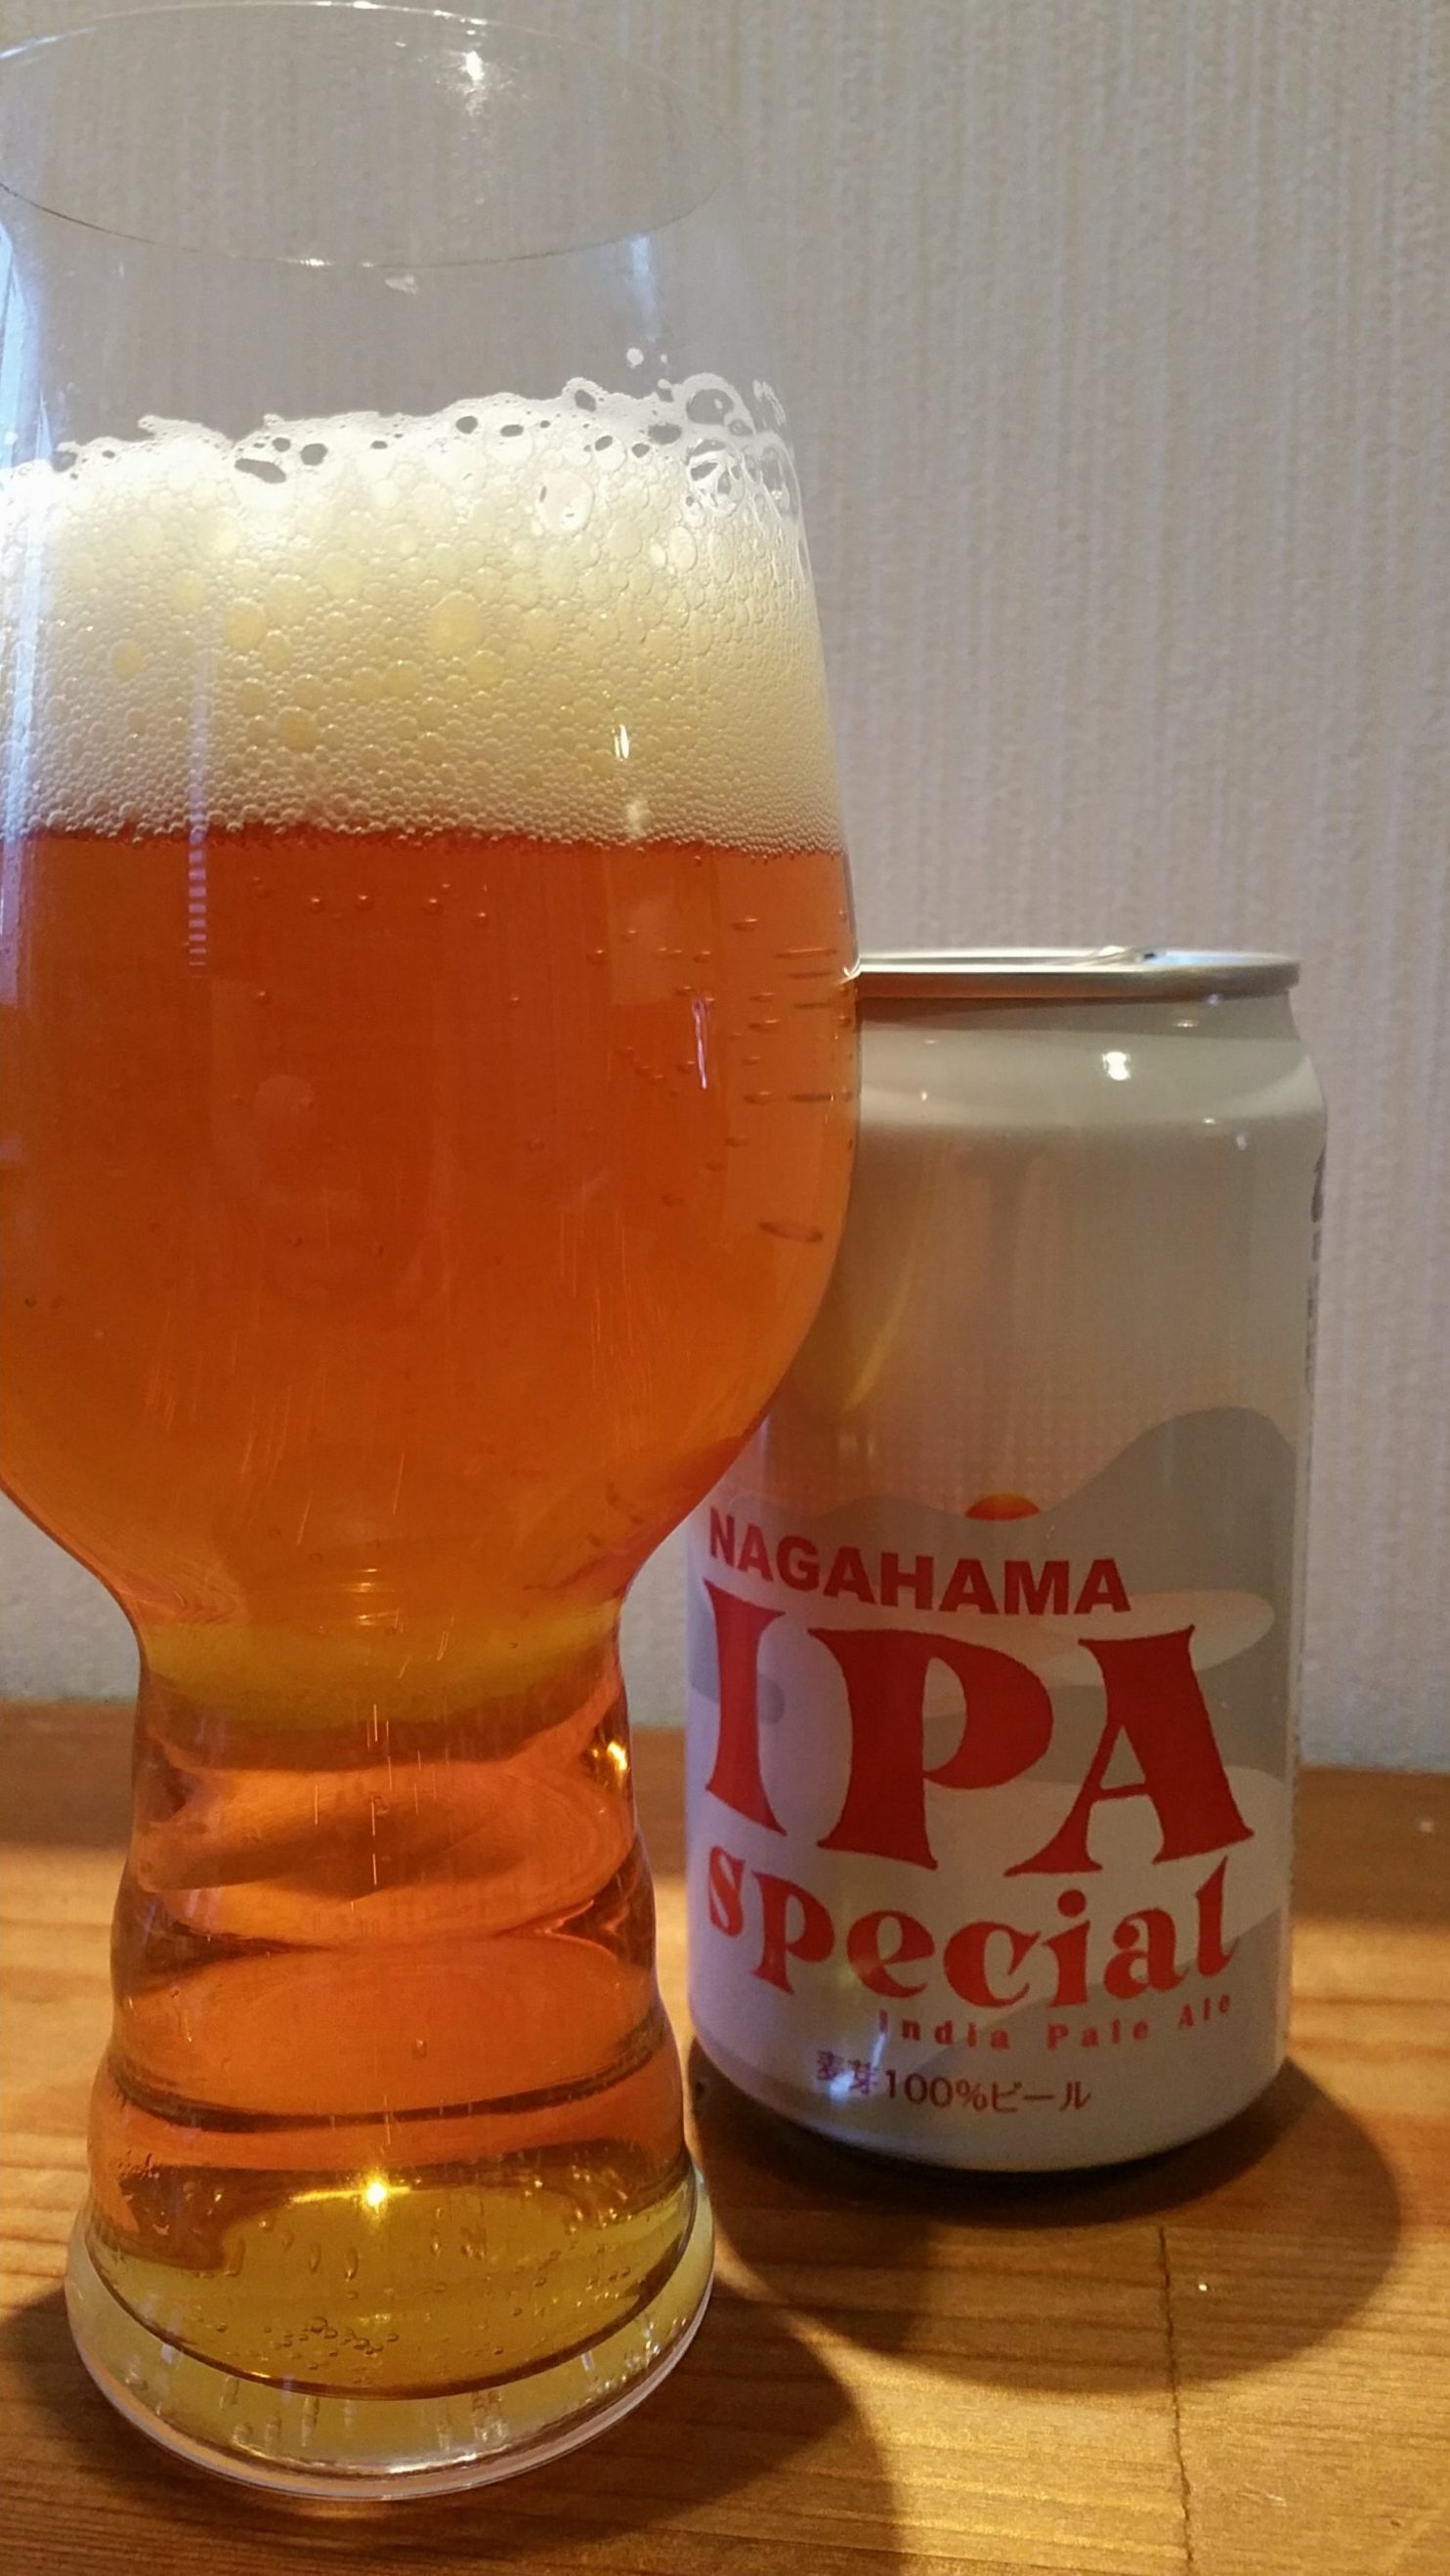 Nagahama IPA Special 長浜IPAスペシャル